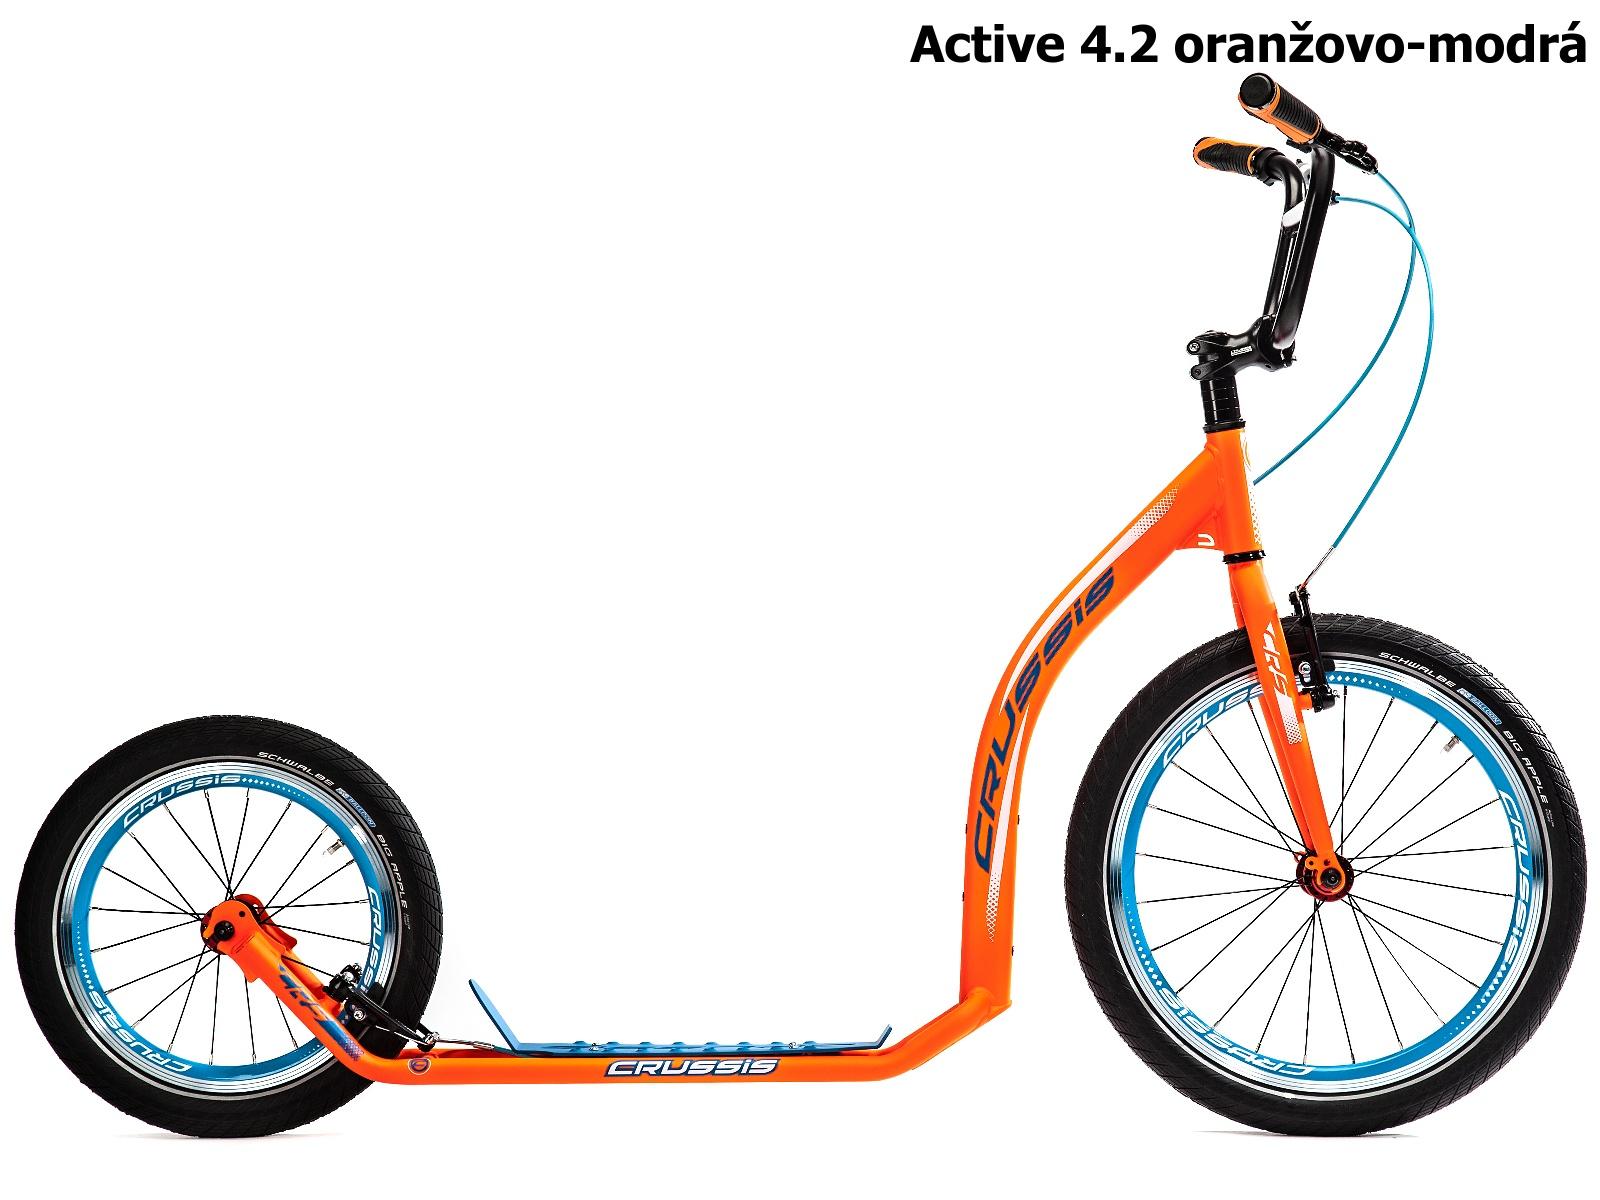 Crussis ACTIVE 4.2 oranžovo-modrá